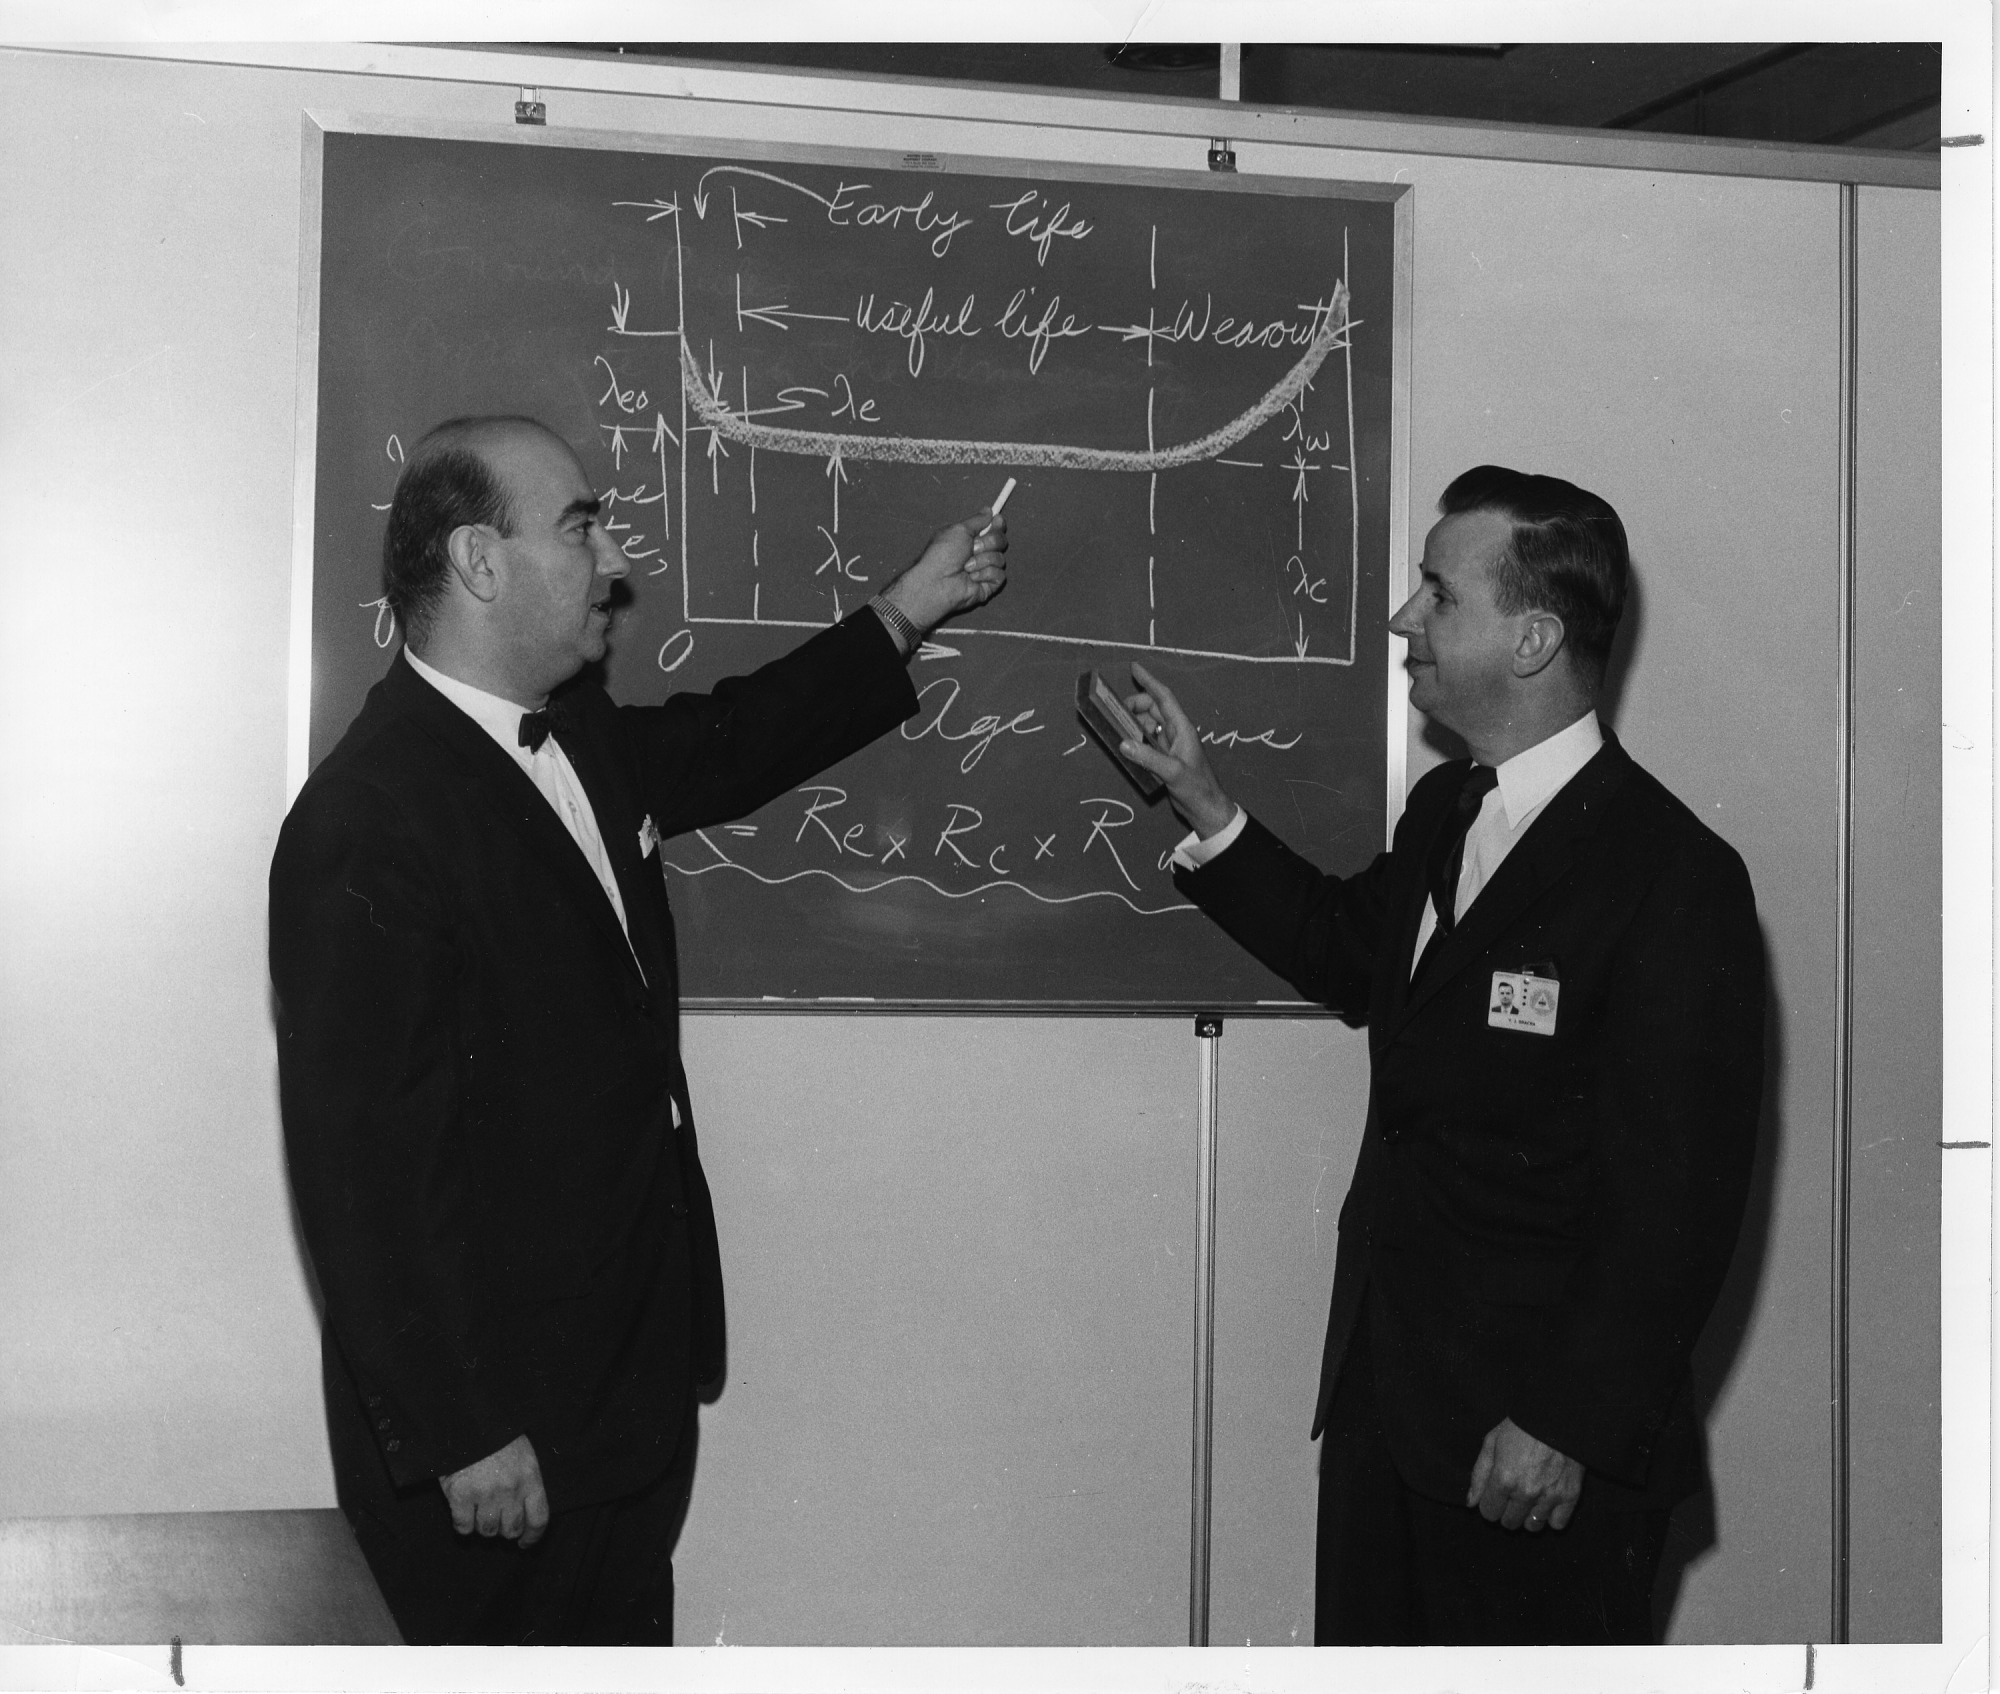 Northrop Space Laboratory publicity photograph shows Professor Dimitri Kececioglu, Department of Aerospace and Mechanical Engineering, University of Arizona, and Northrop engineer Vincent J. Bracha, SIA2007-0330